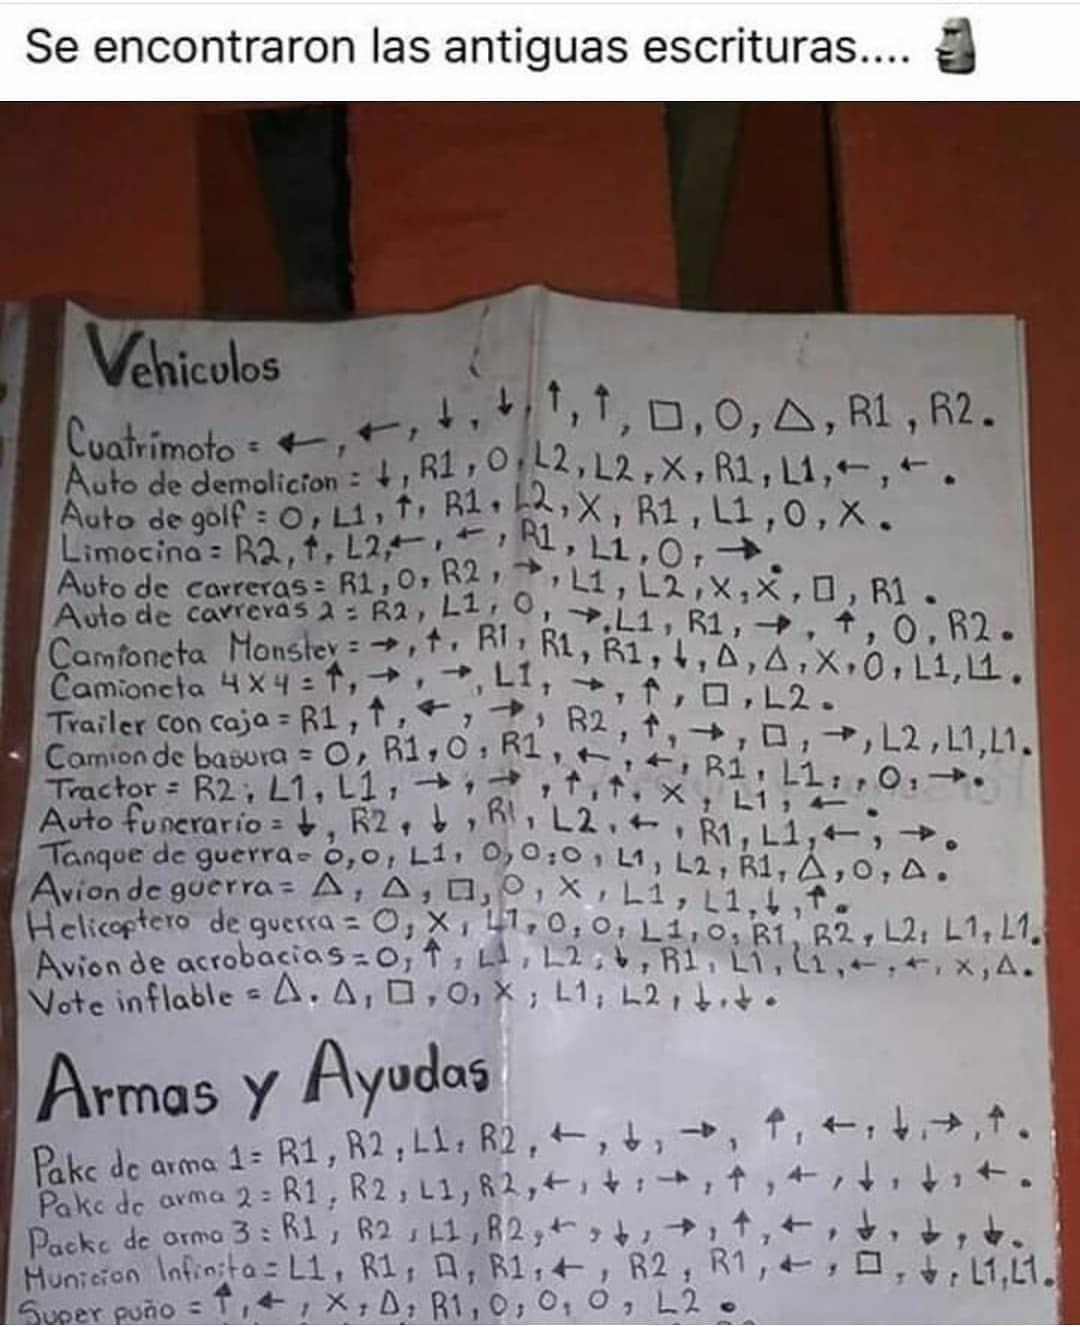 Se encontraron las antiguas escrituras...